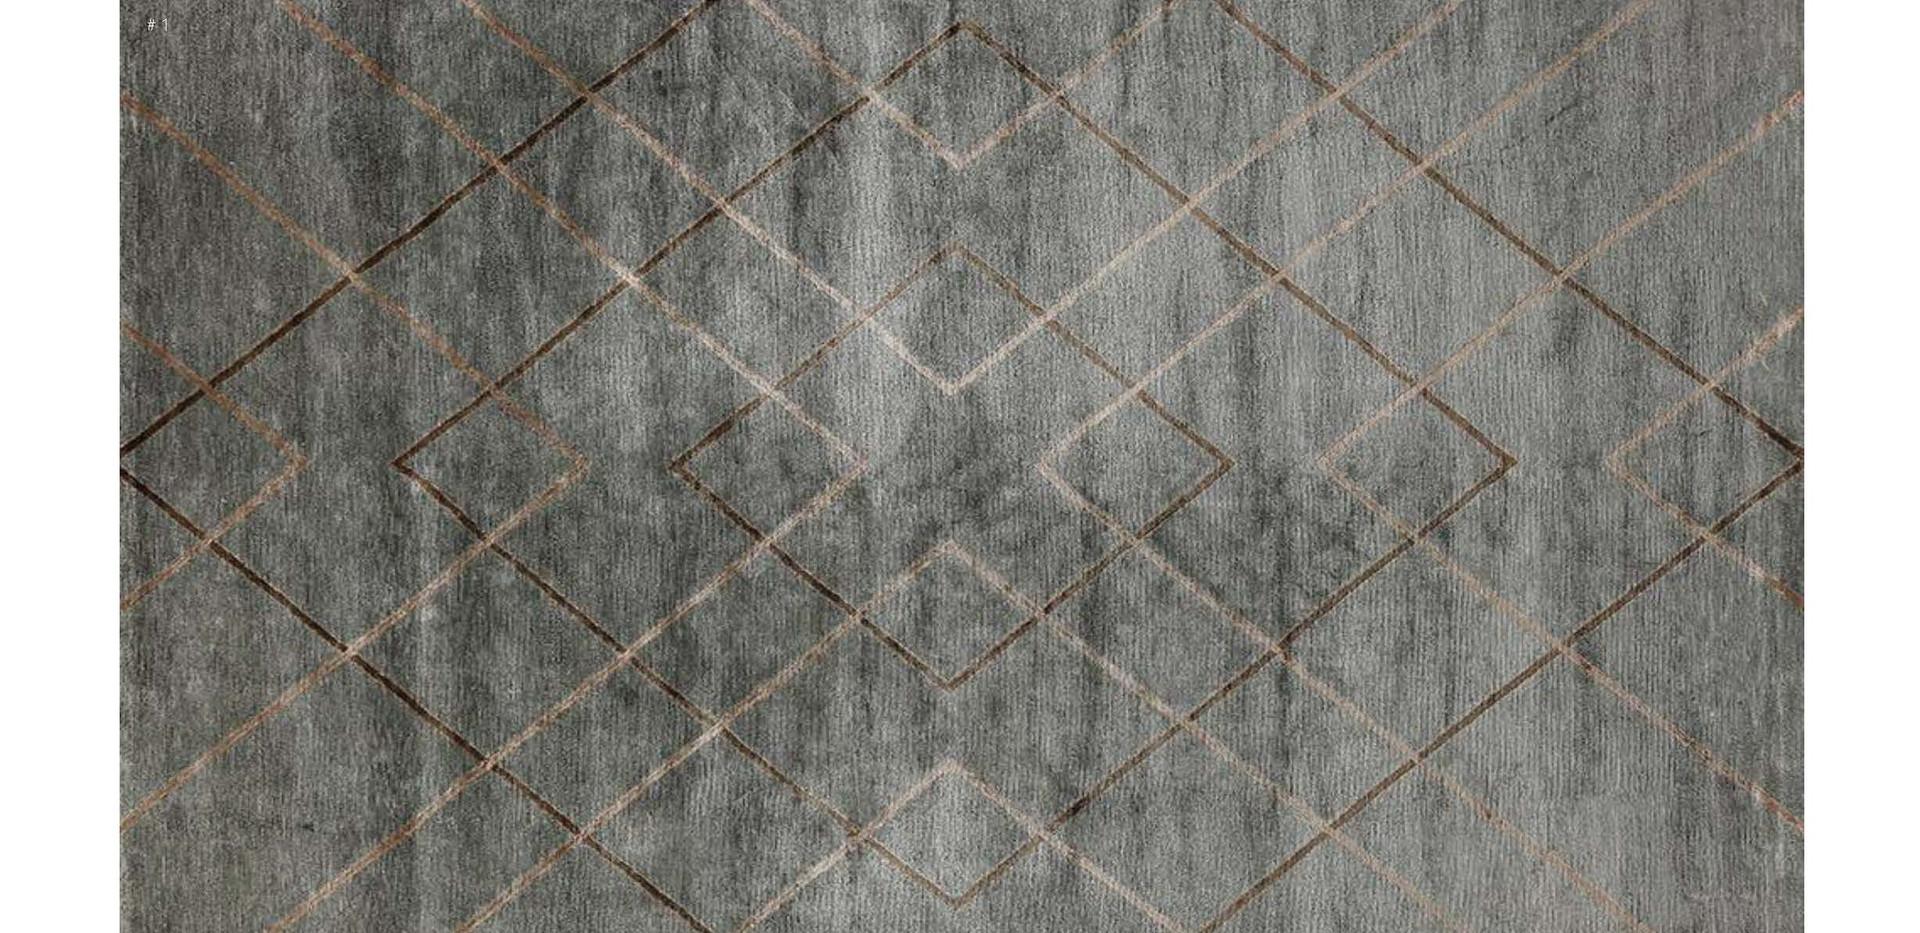 13. Geometric Designs 03.jpg